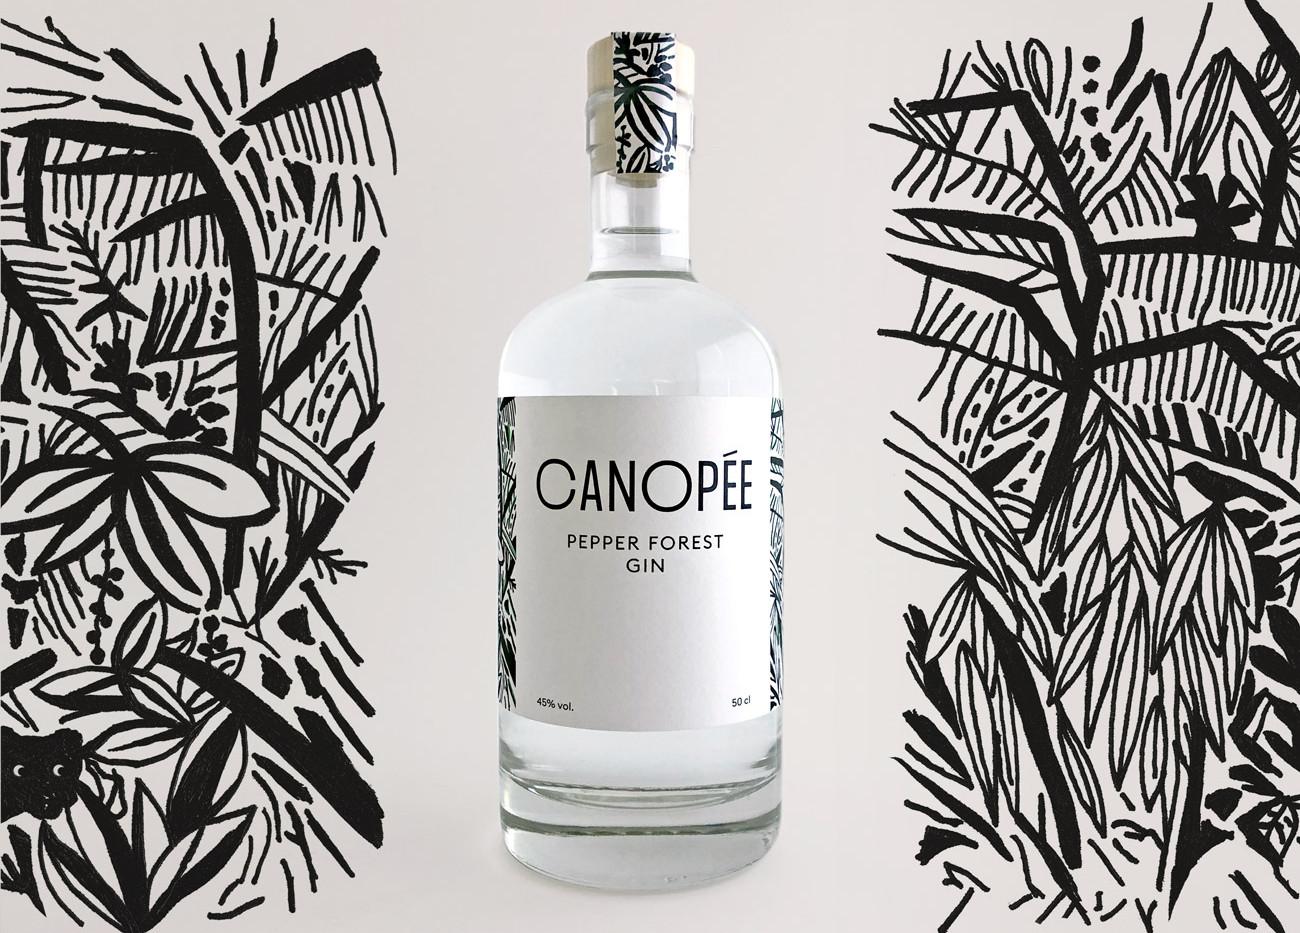 Canopee_Pepper_Forest_Gin_50cl.jpg